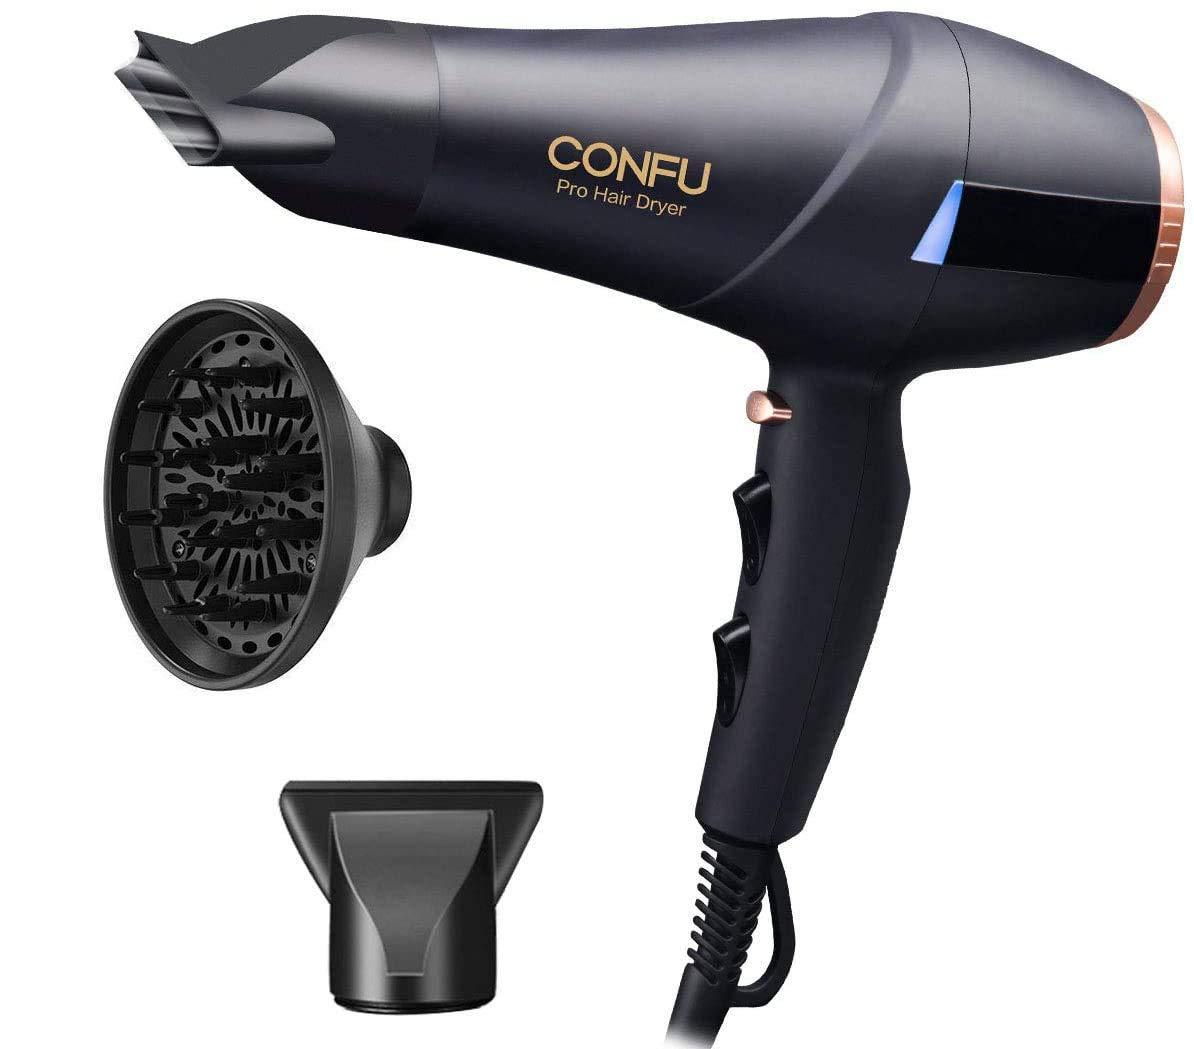 secador de soplado con 2 velocidades y 3 ajustes Secador de pelo profesional difusor secador para cabello rizado 2300 W AC-Motor i/ónico secador de pelo con concentrador de flujo de aire